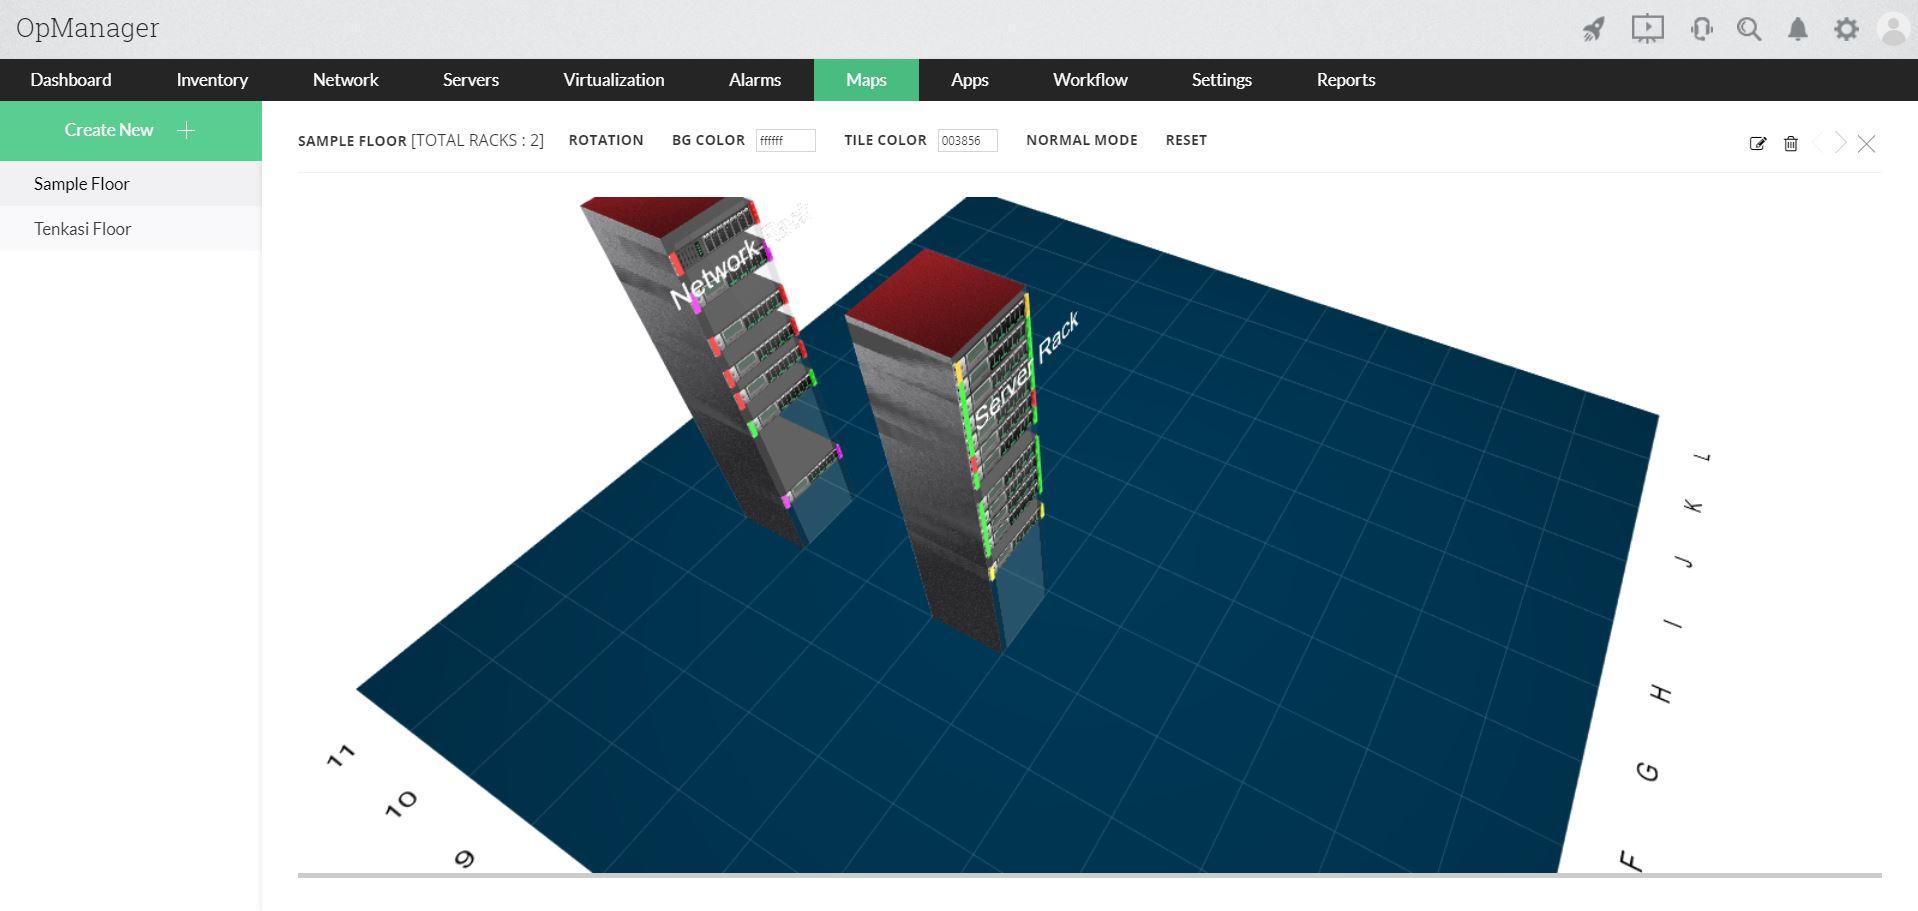 Herramienta de mapeo de redes - ManageEngine OpManager